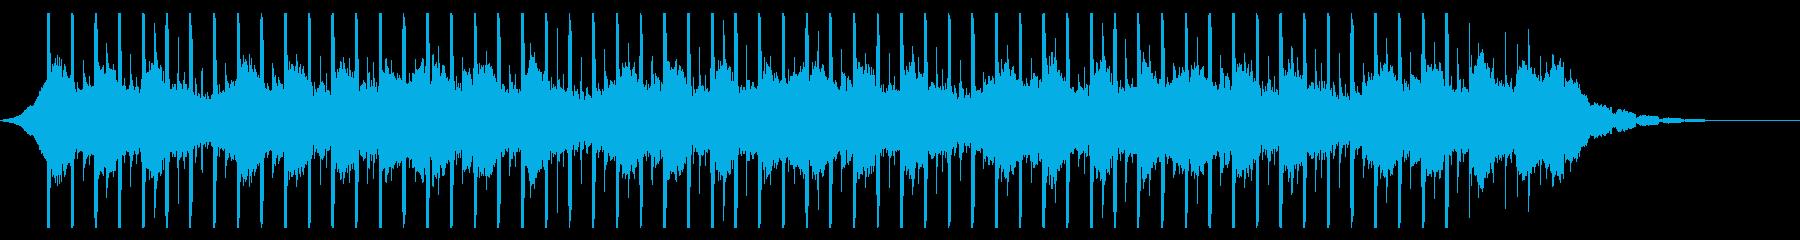 The Construction (40 Sec)'s reproduced waveform